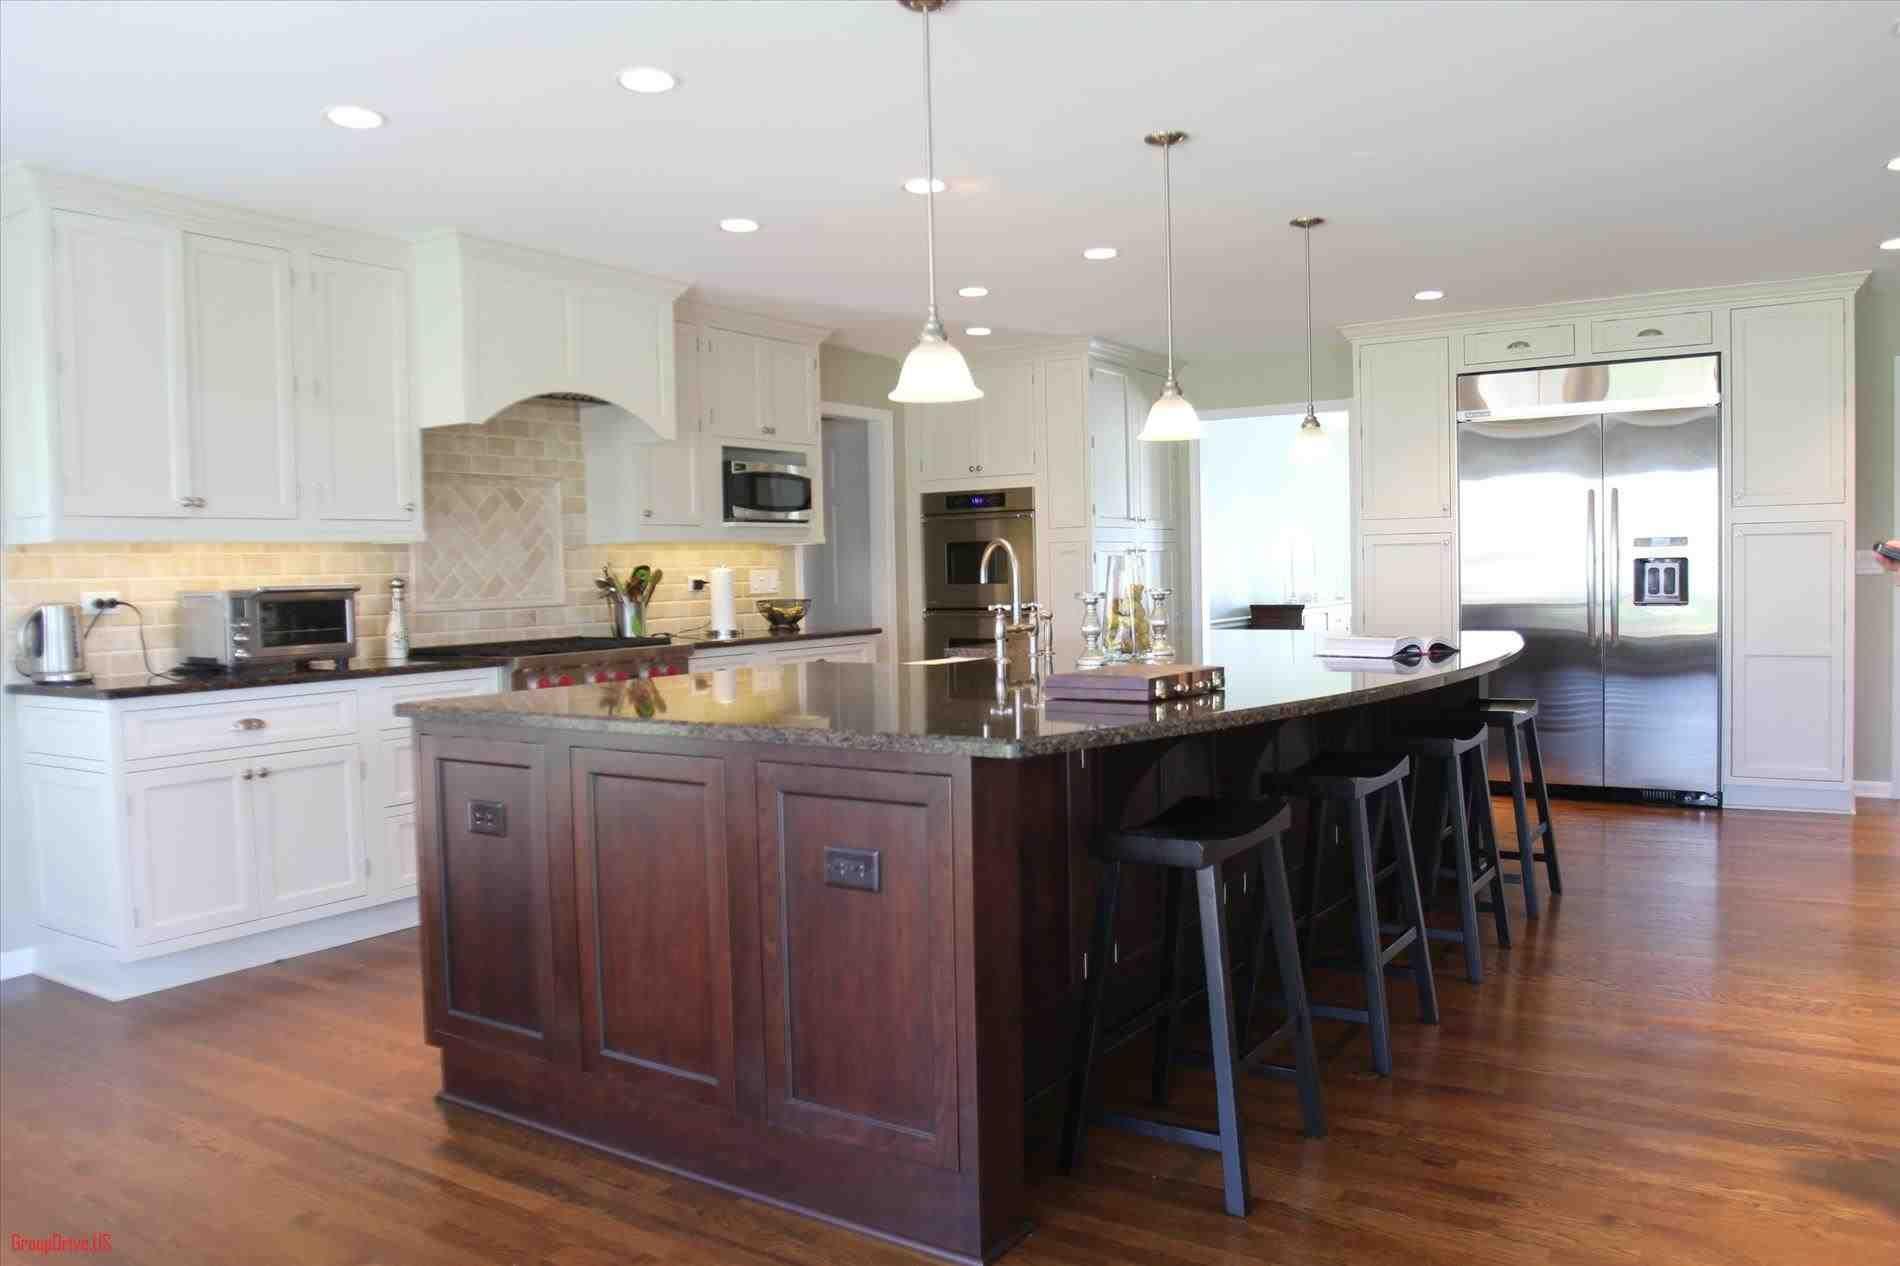 New post marble top kitchen island cart decors ideas pinterest